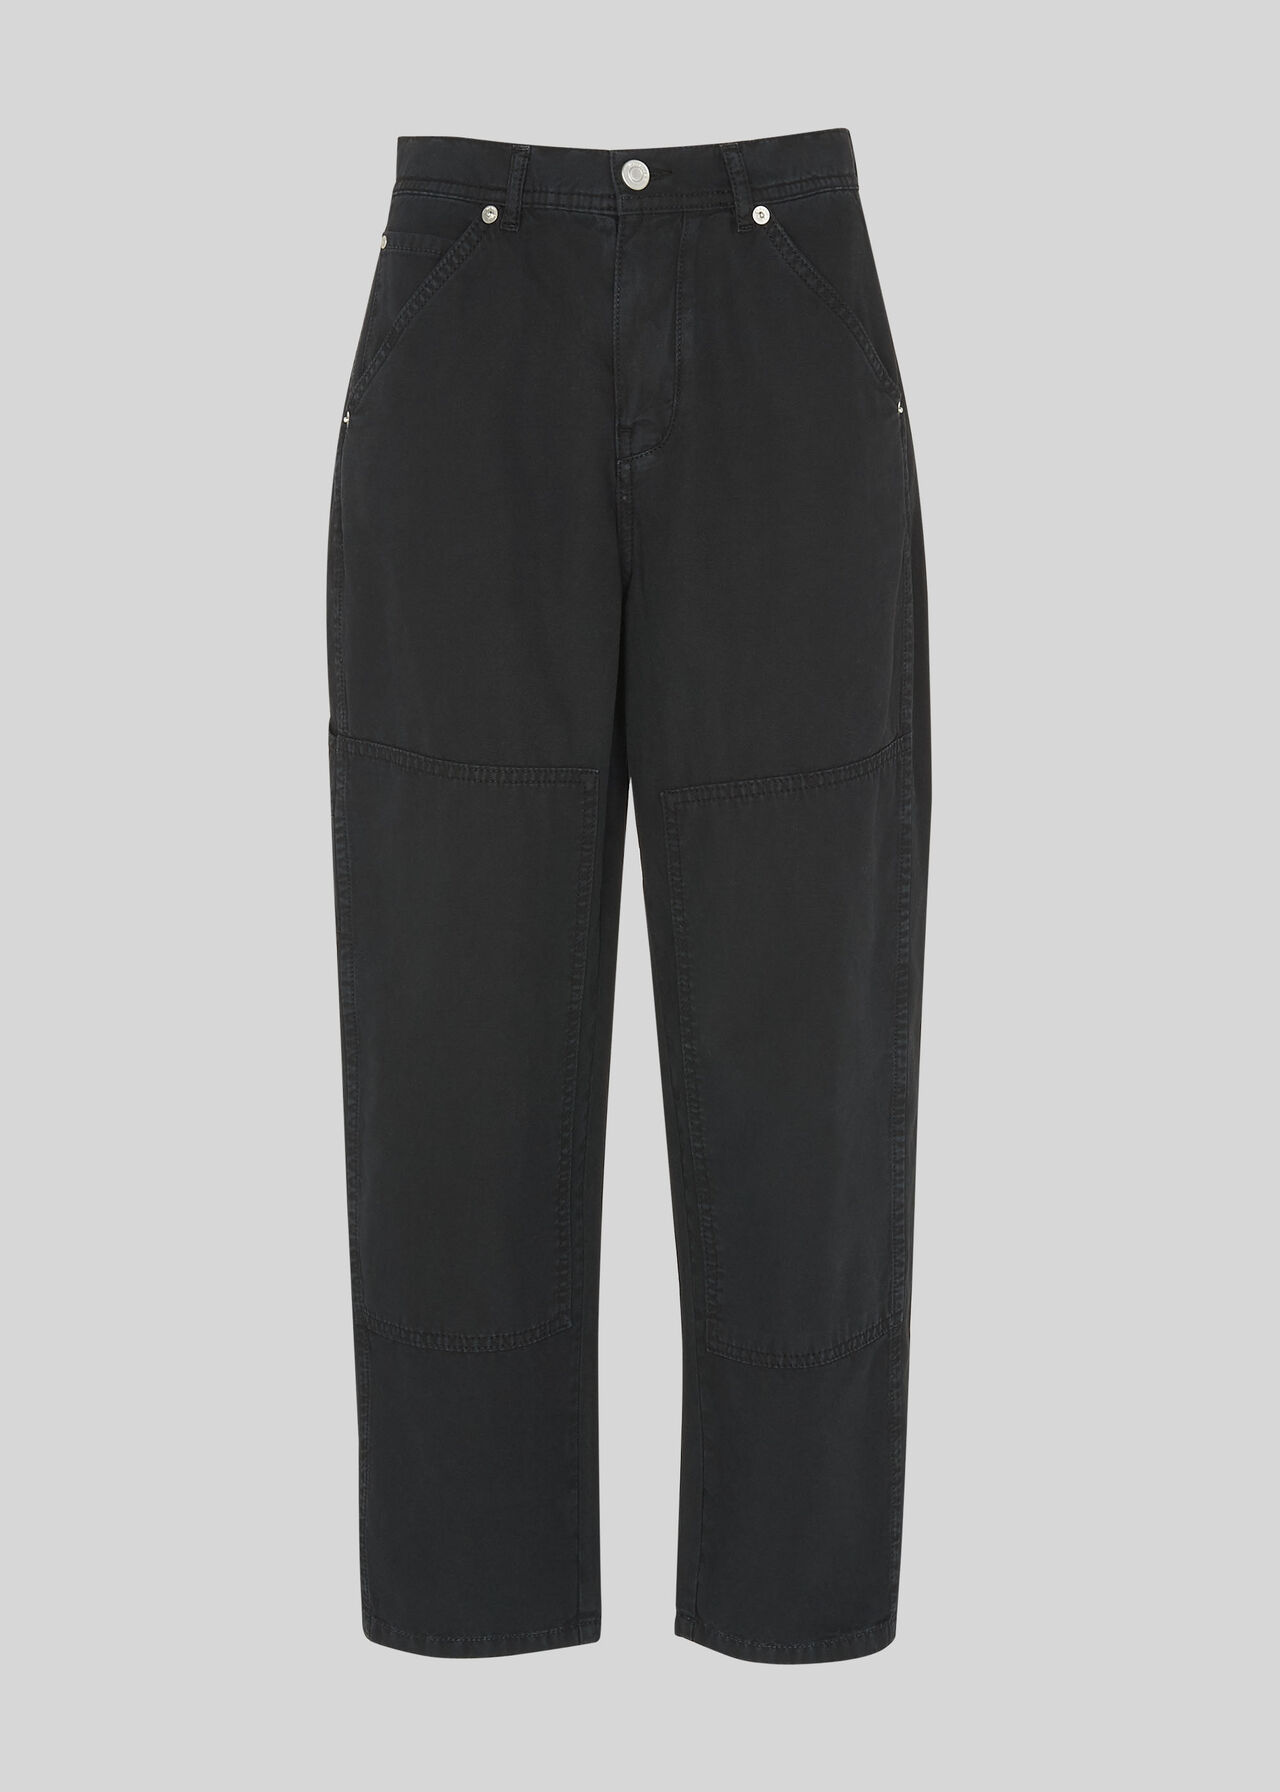 Cargo Panel Detail Trousers Black